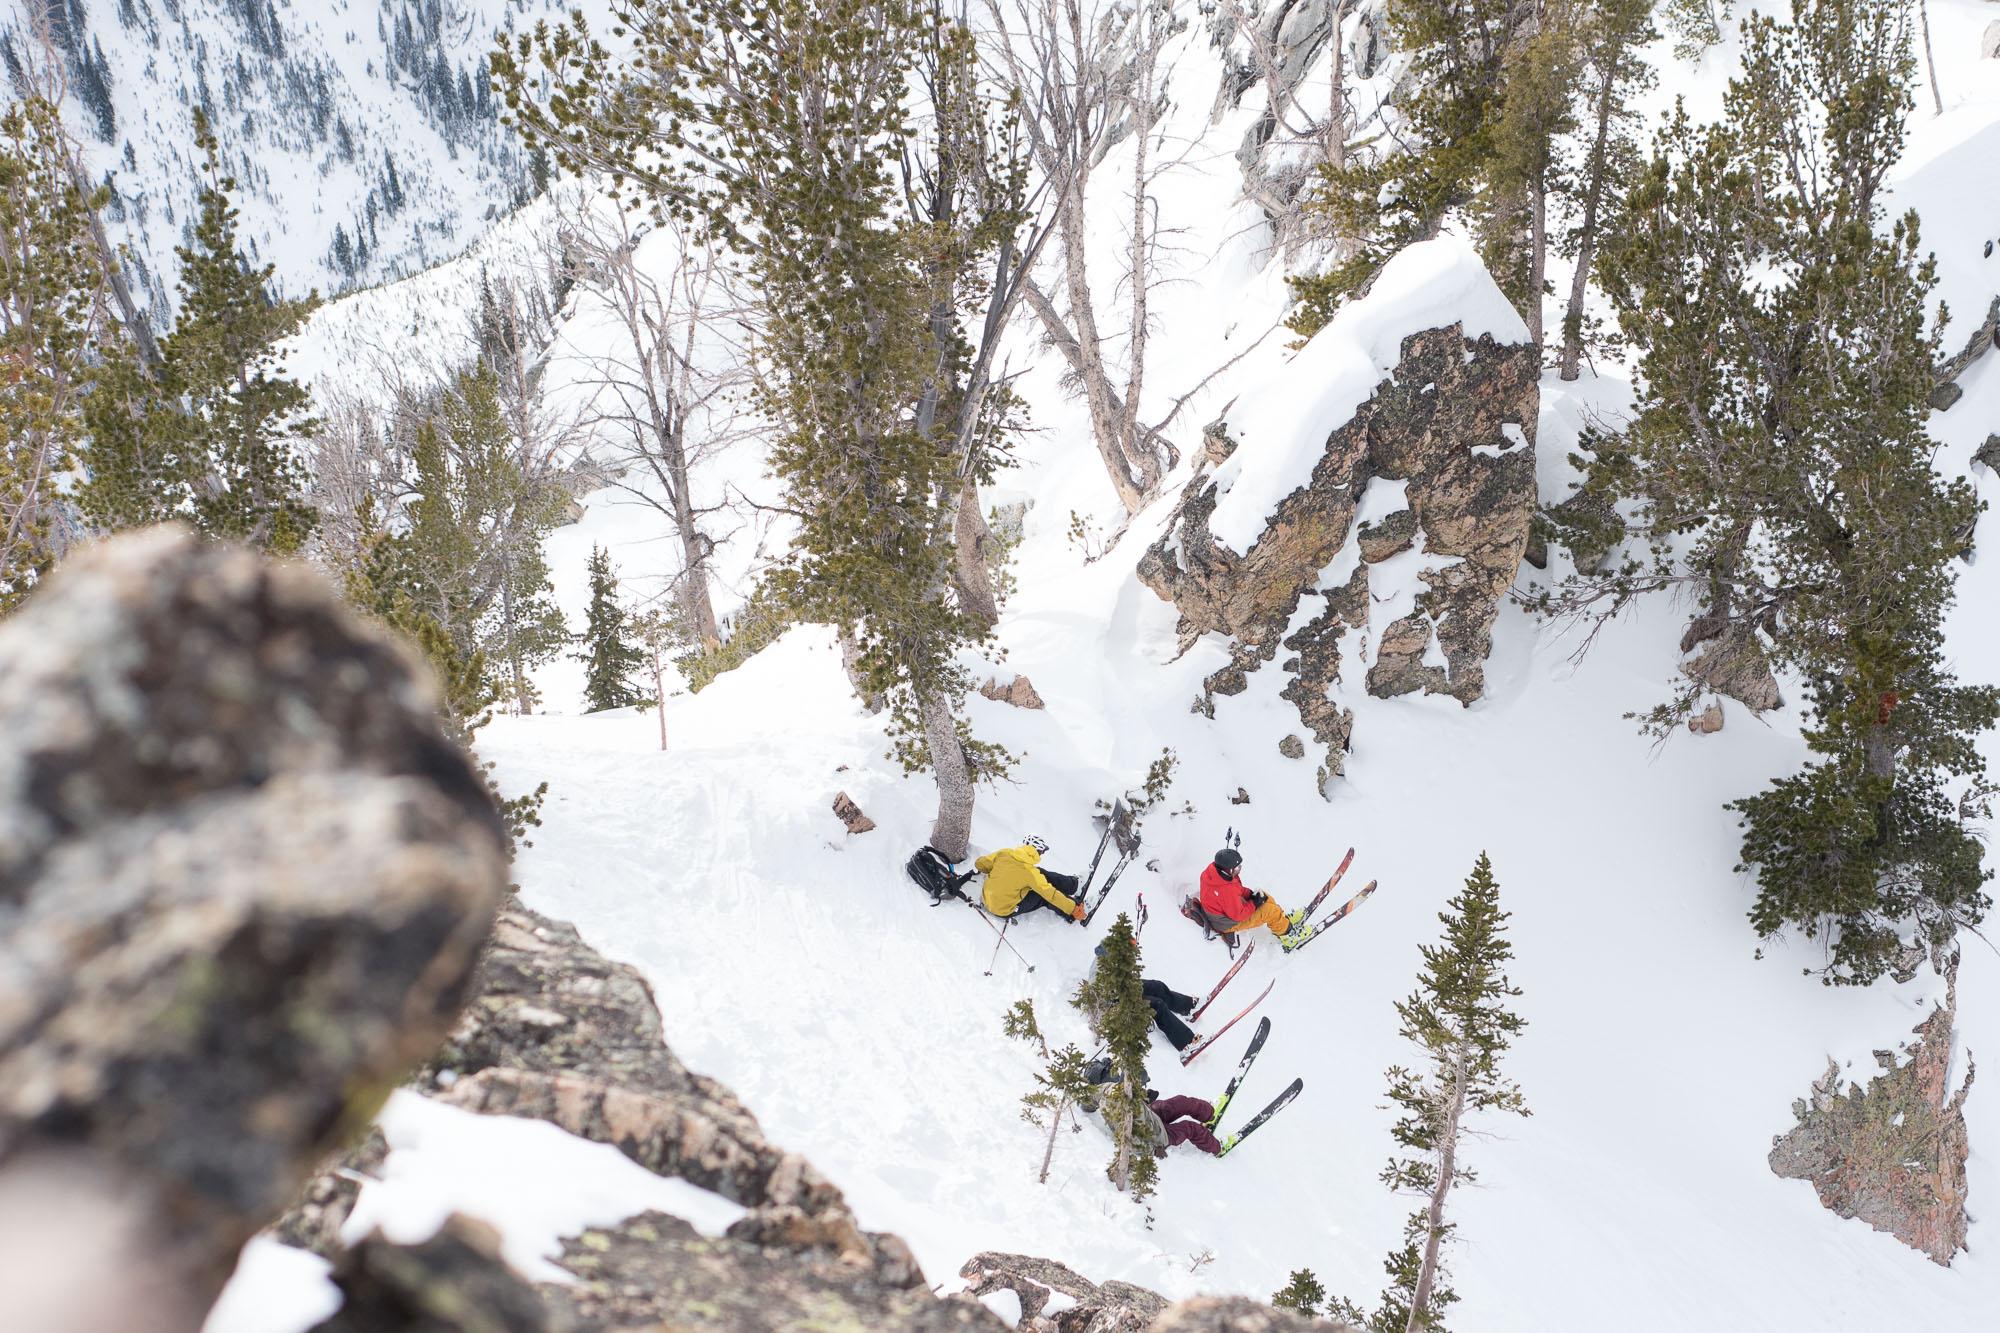 Skiers waiting